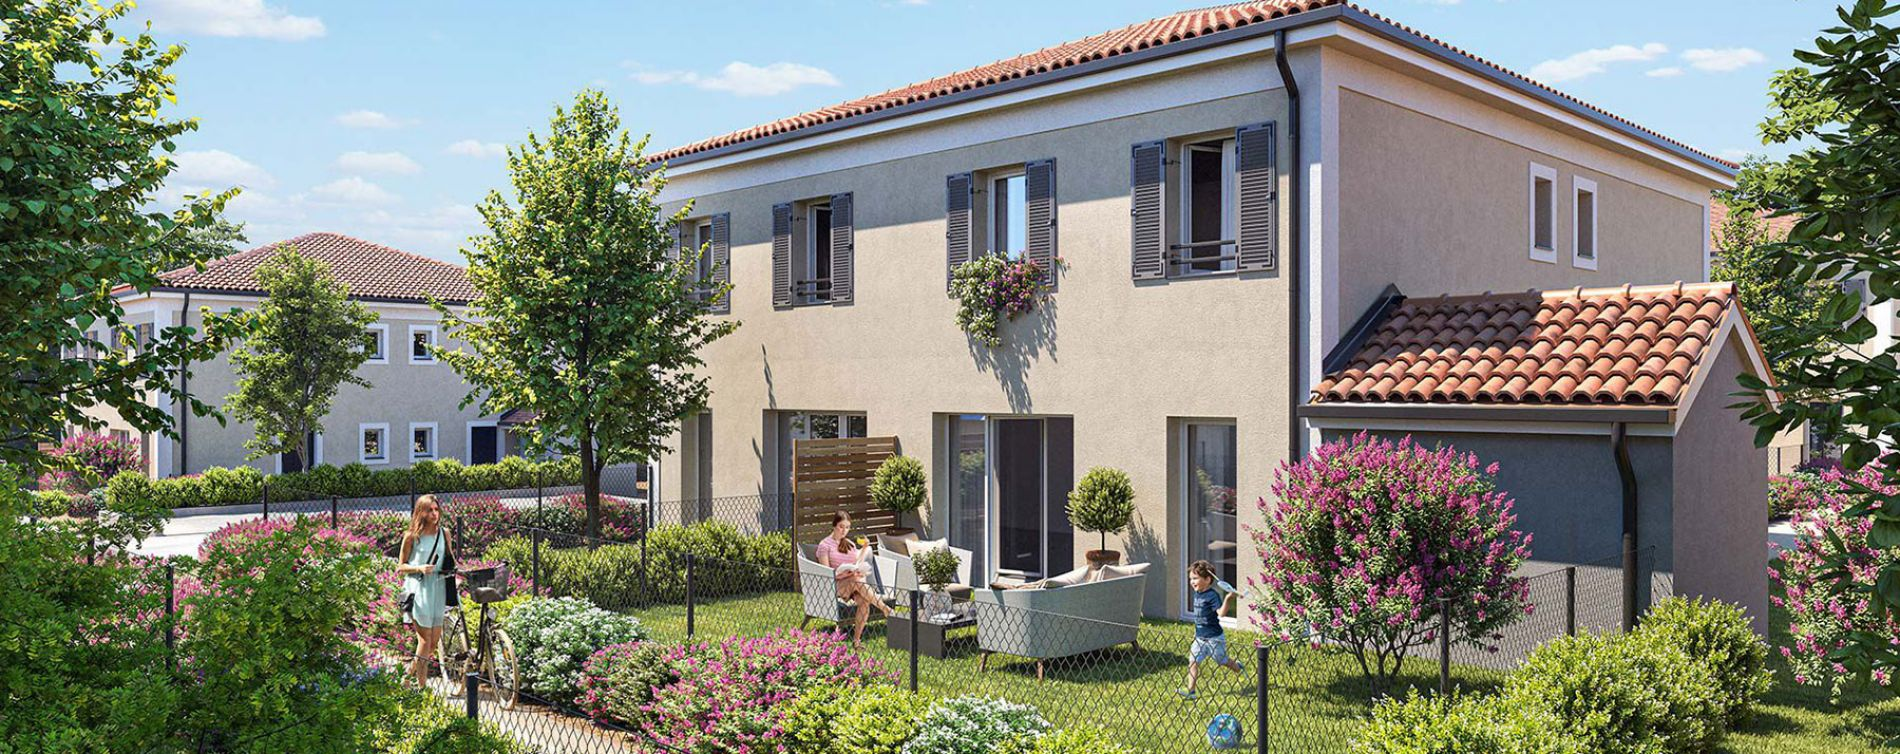 Brignoles : programme immobilier neuve « Les Bastides de Tombarel » (2)